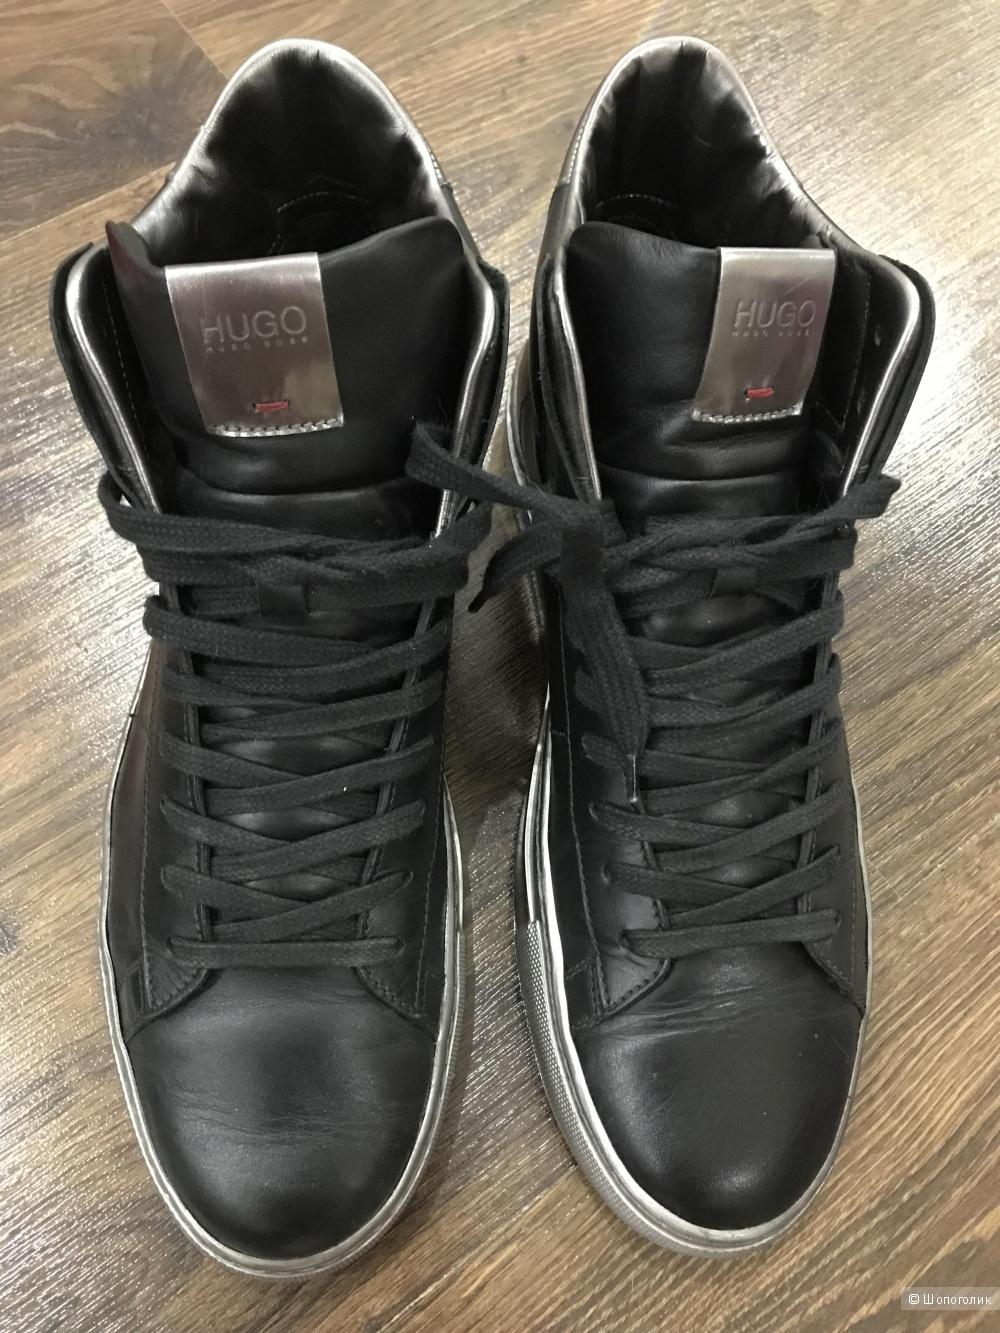 Мужские ботинки Hugo boss,  43 размер